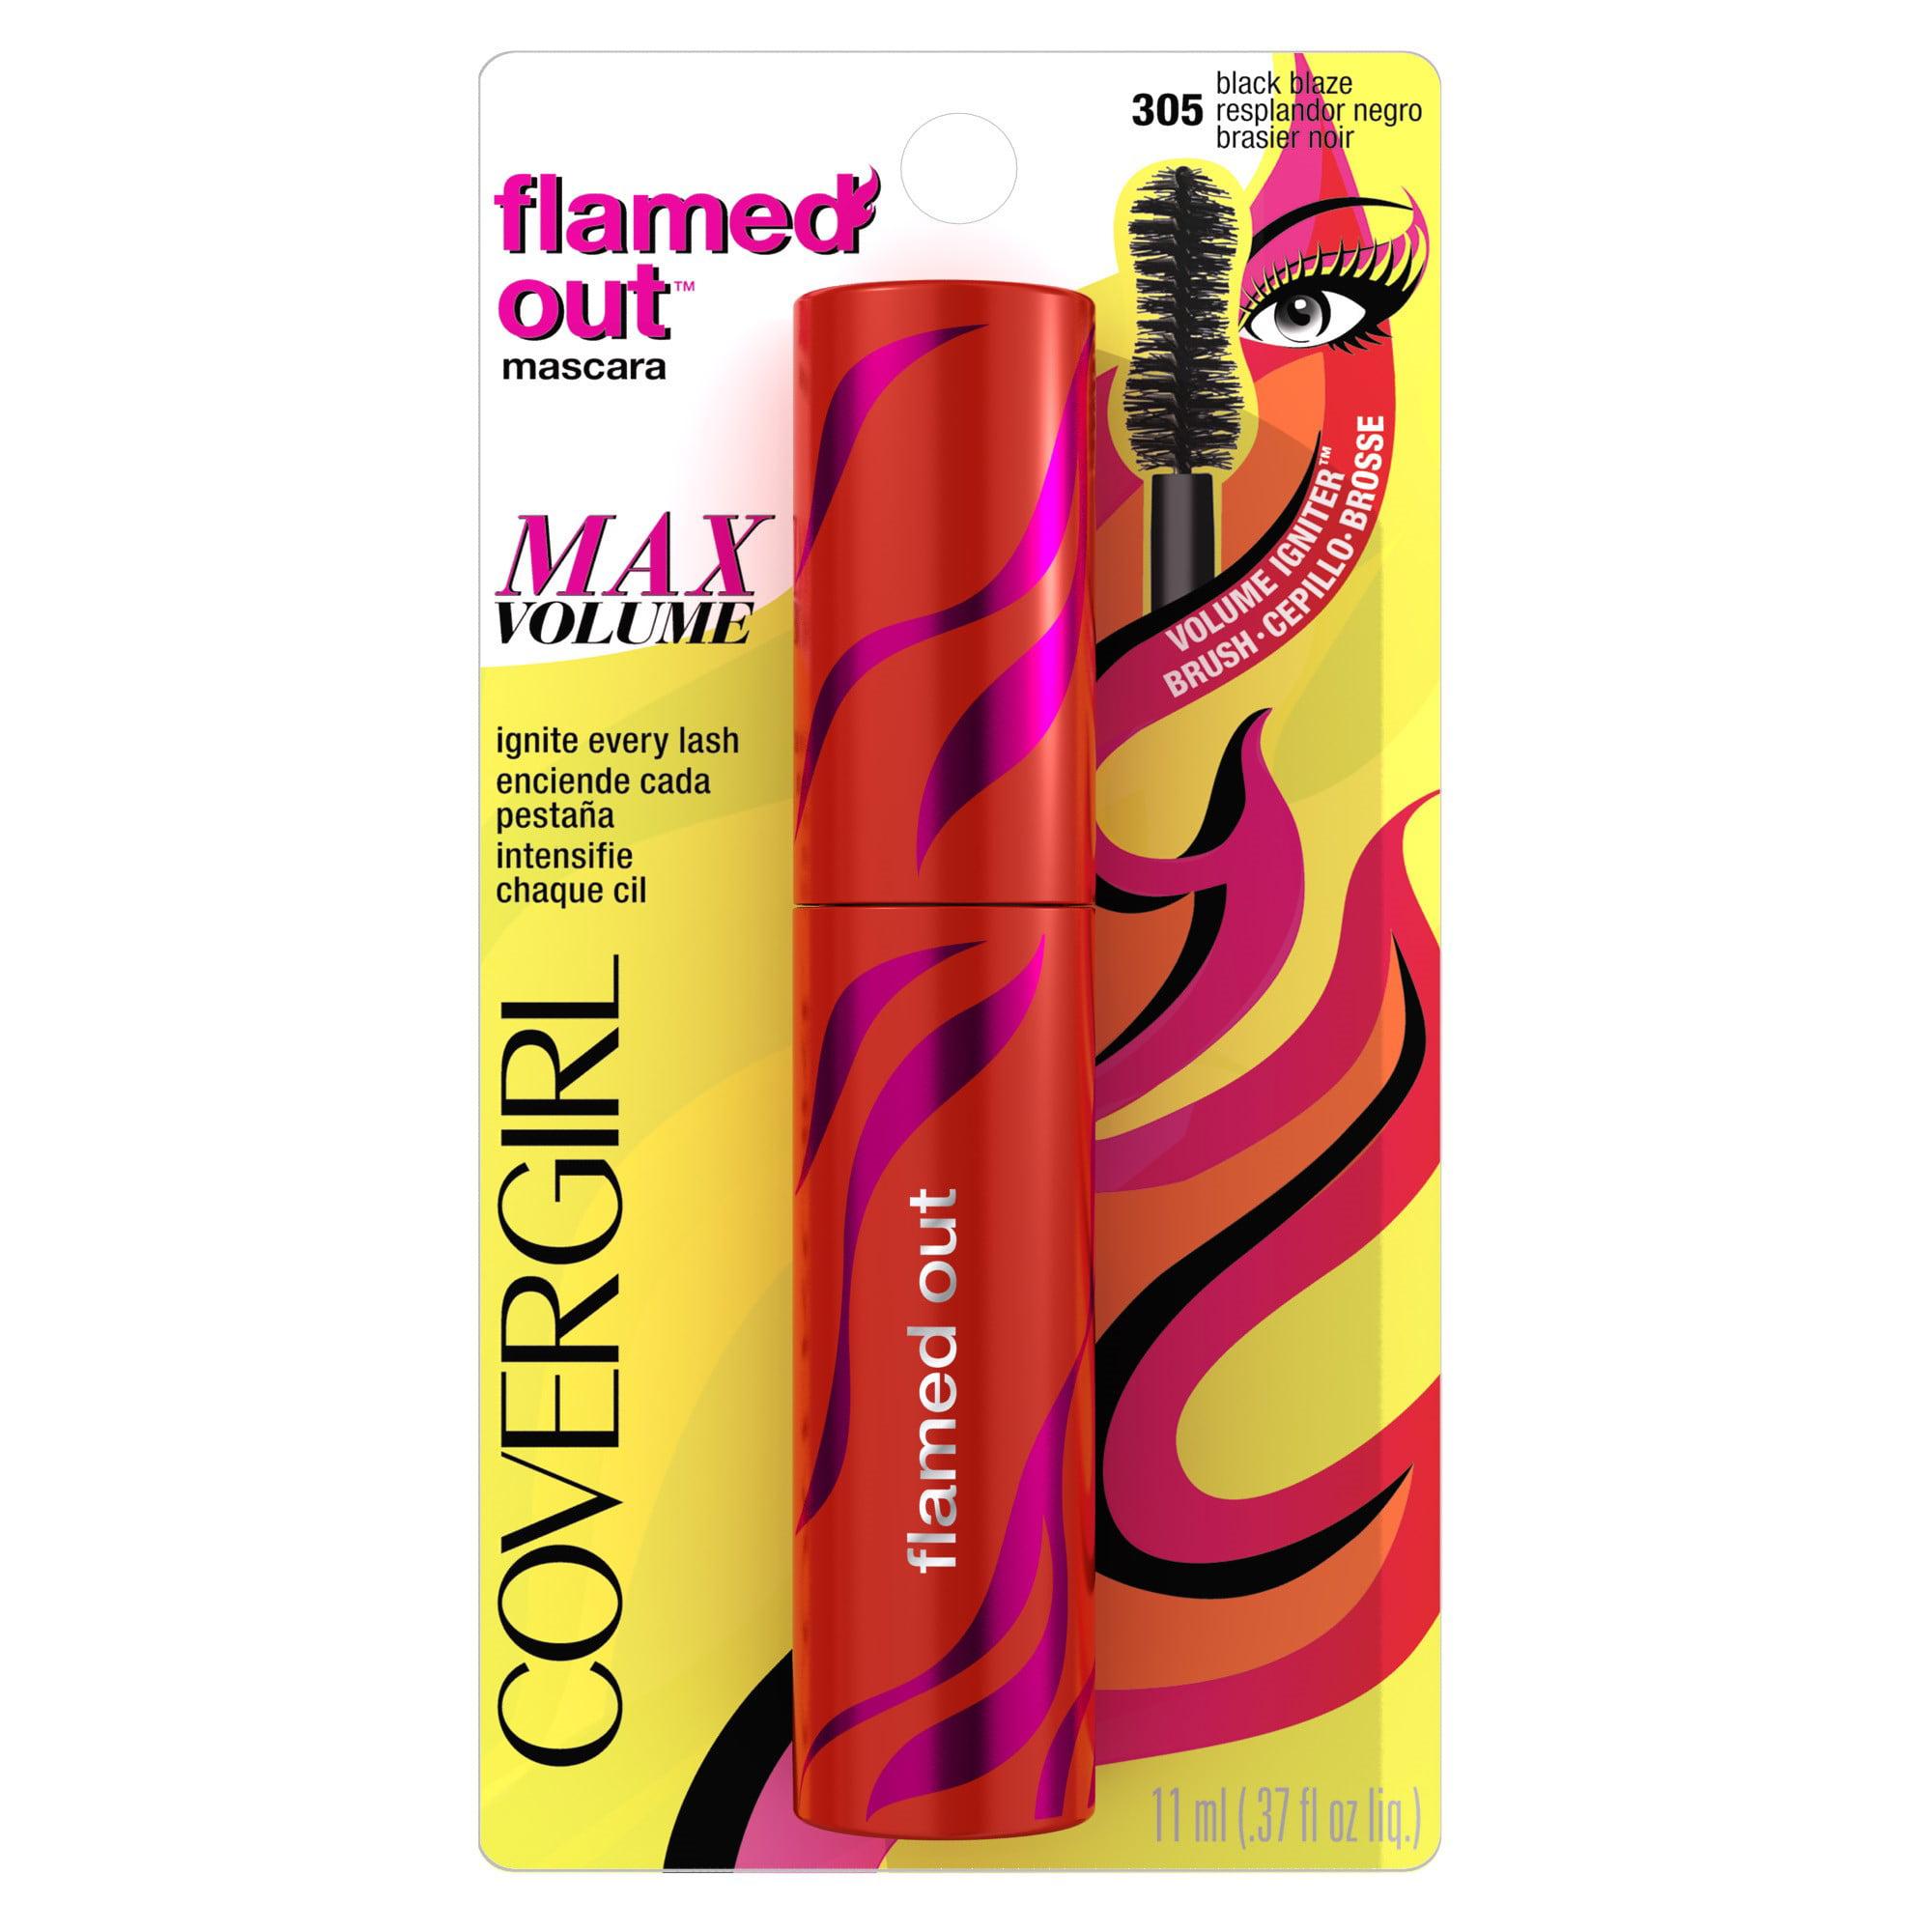 COVERGIRL Flamed Out Waterproof Mascara, Black Blaze, 0.37 Oz